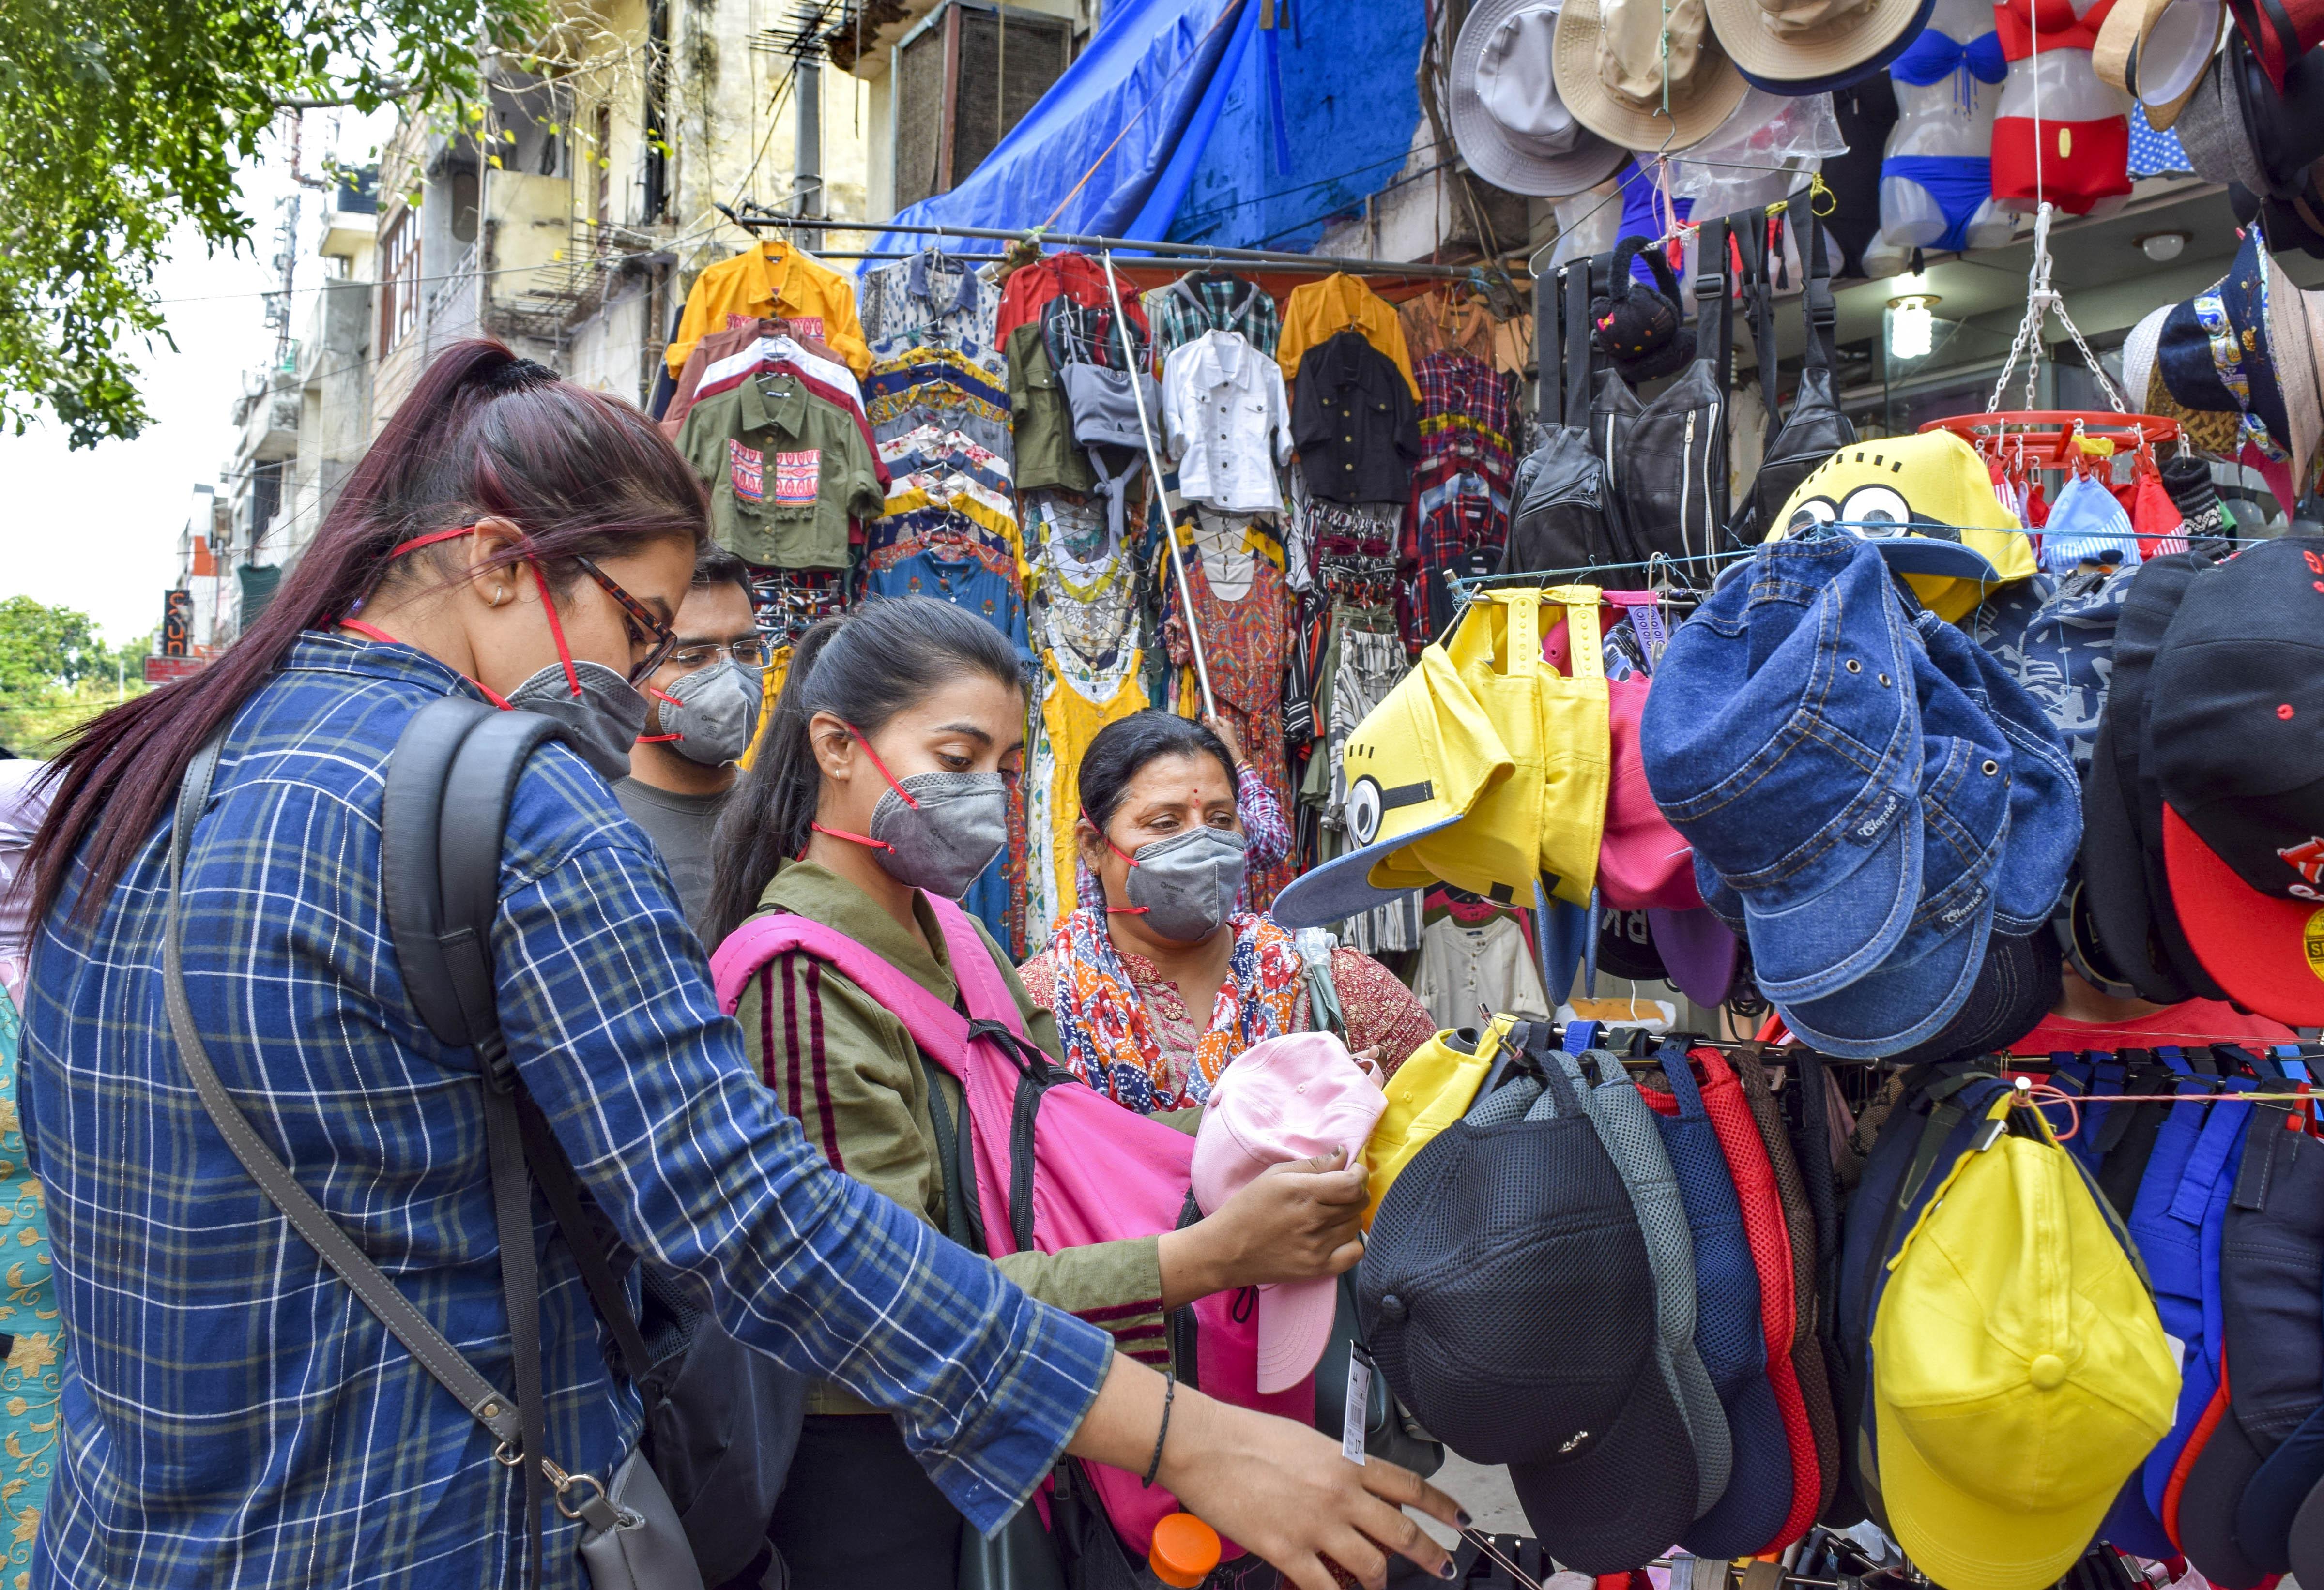 Customers wear protective mask in view of coronavirus pandemic, at Sarojini Nagar market in New Delhi, Sunday, March 15, 2020